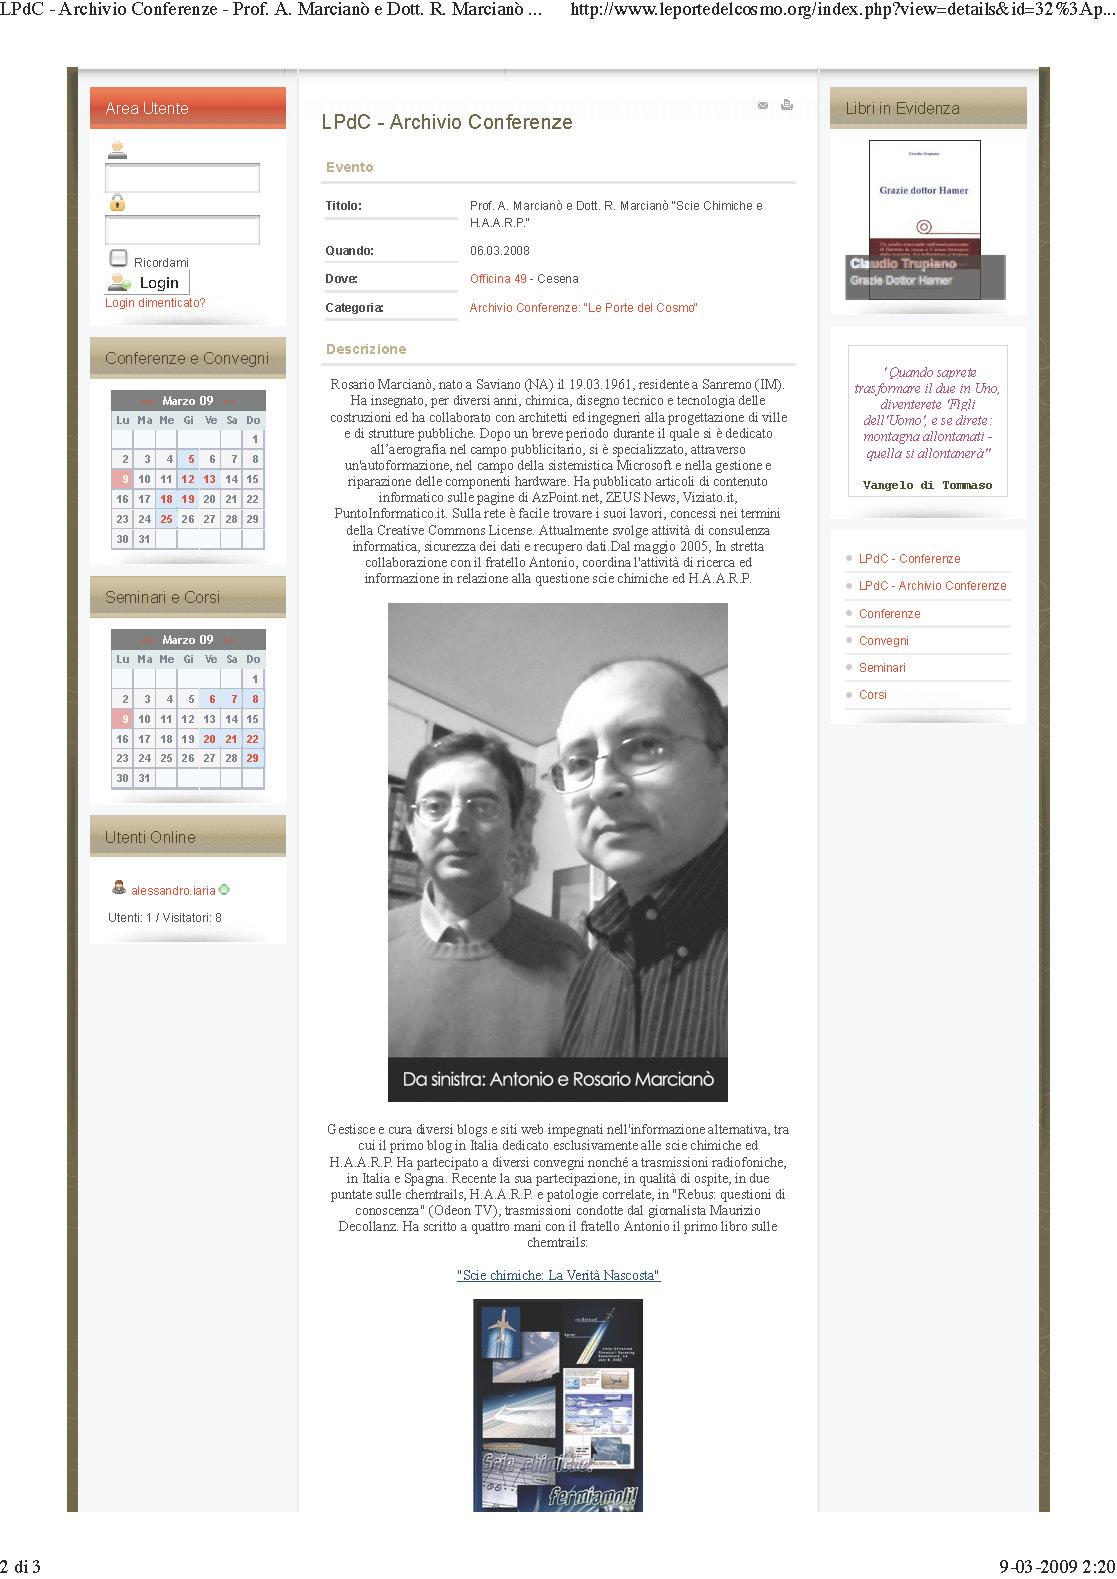 [LPdC+-+Archivio+Conferenze+-+Prof.+A.+Marcianò+e+Dott.+R.+Marcianò+]